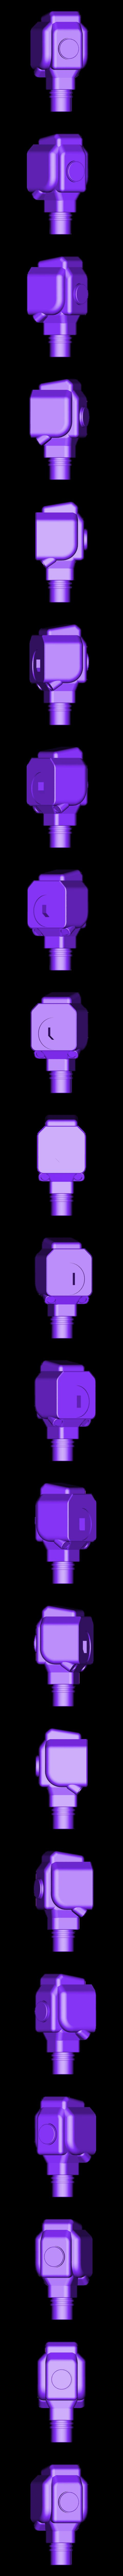 turret.stl Download free STL file Light Armor Tank • Object to 3D print, cycstudio